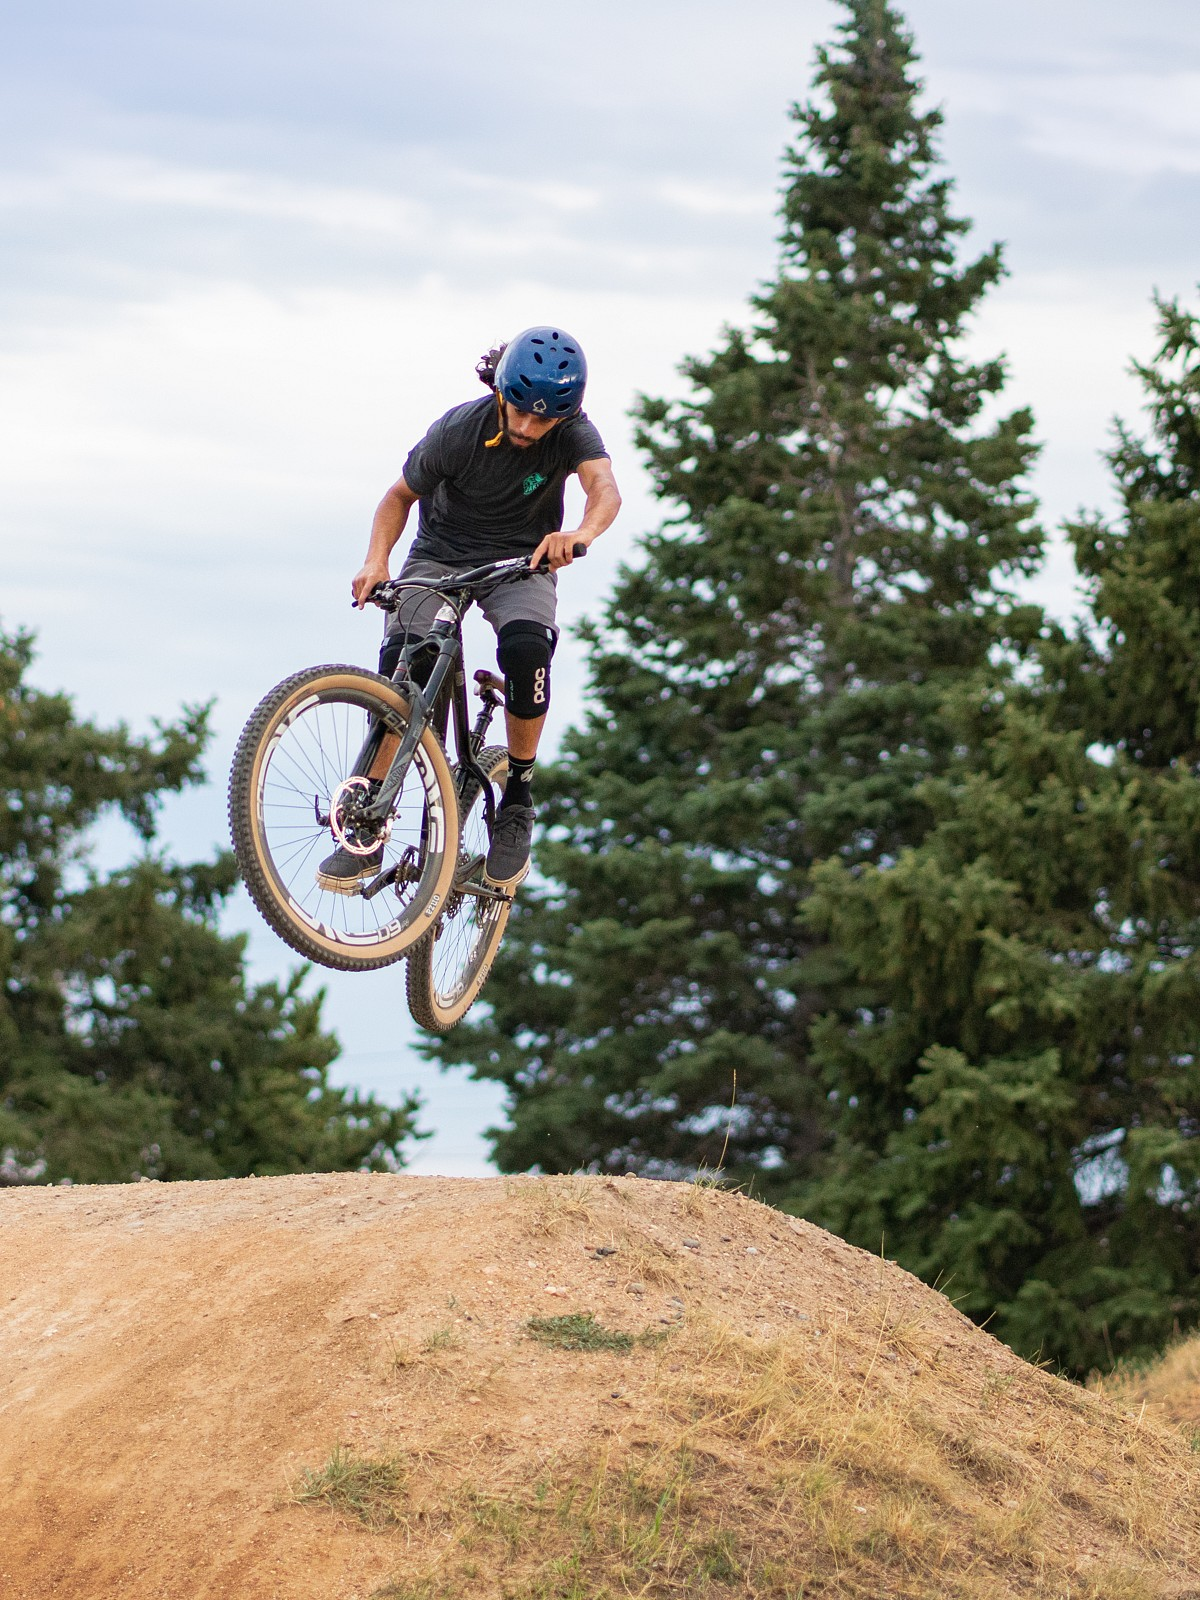 DSC08974-Edit - ur_pal_al - Mountain Biking Pictures - Vital MTB